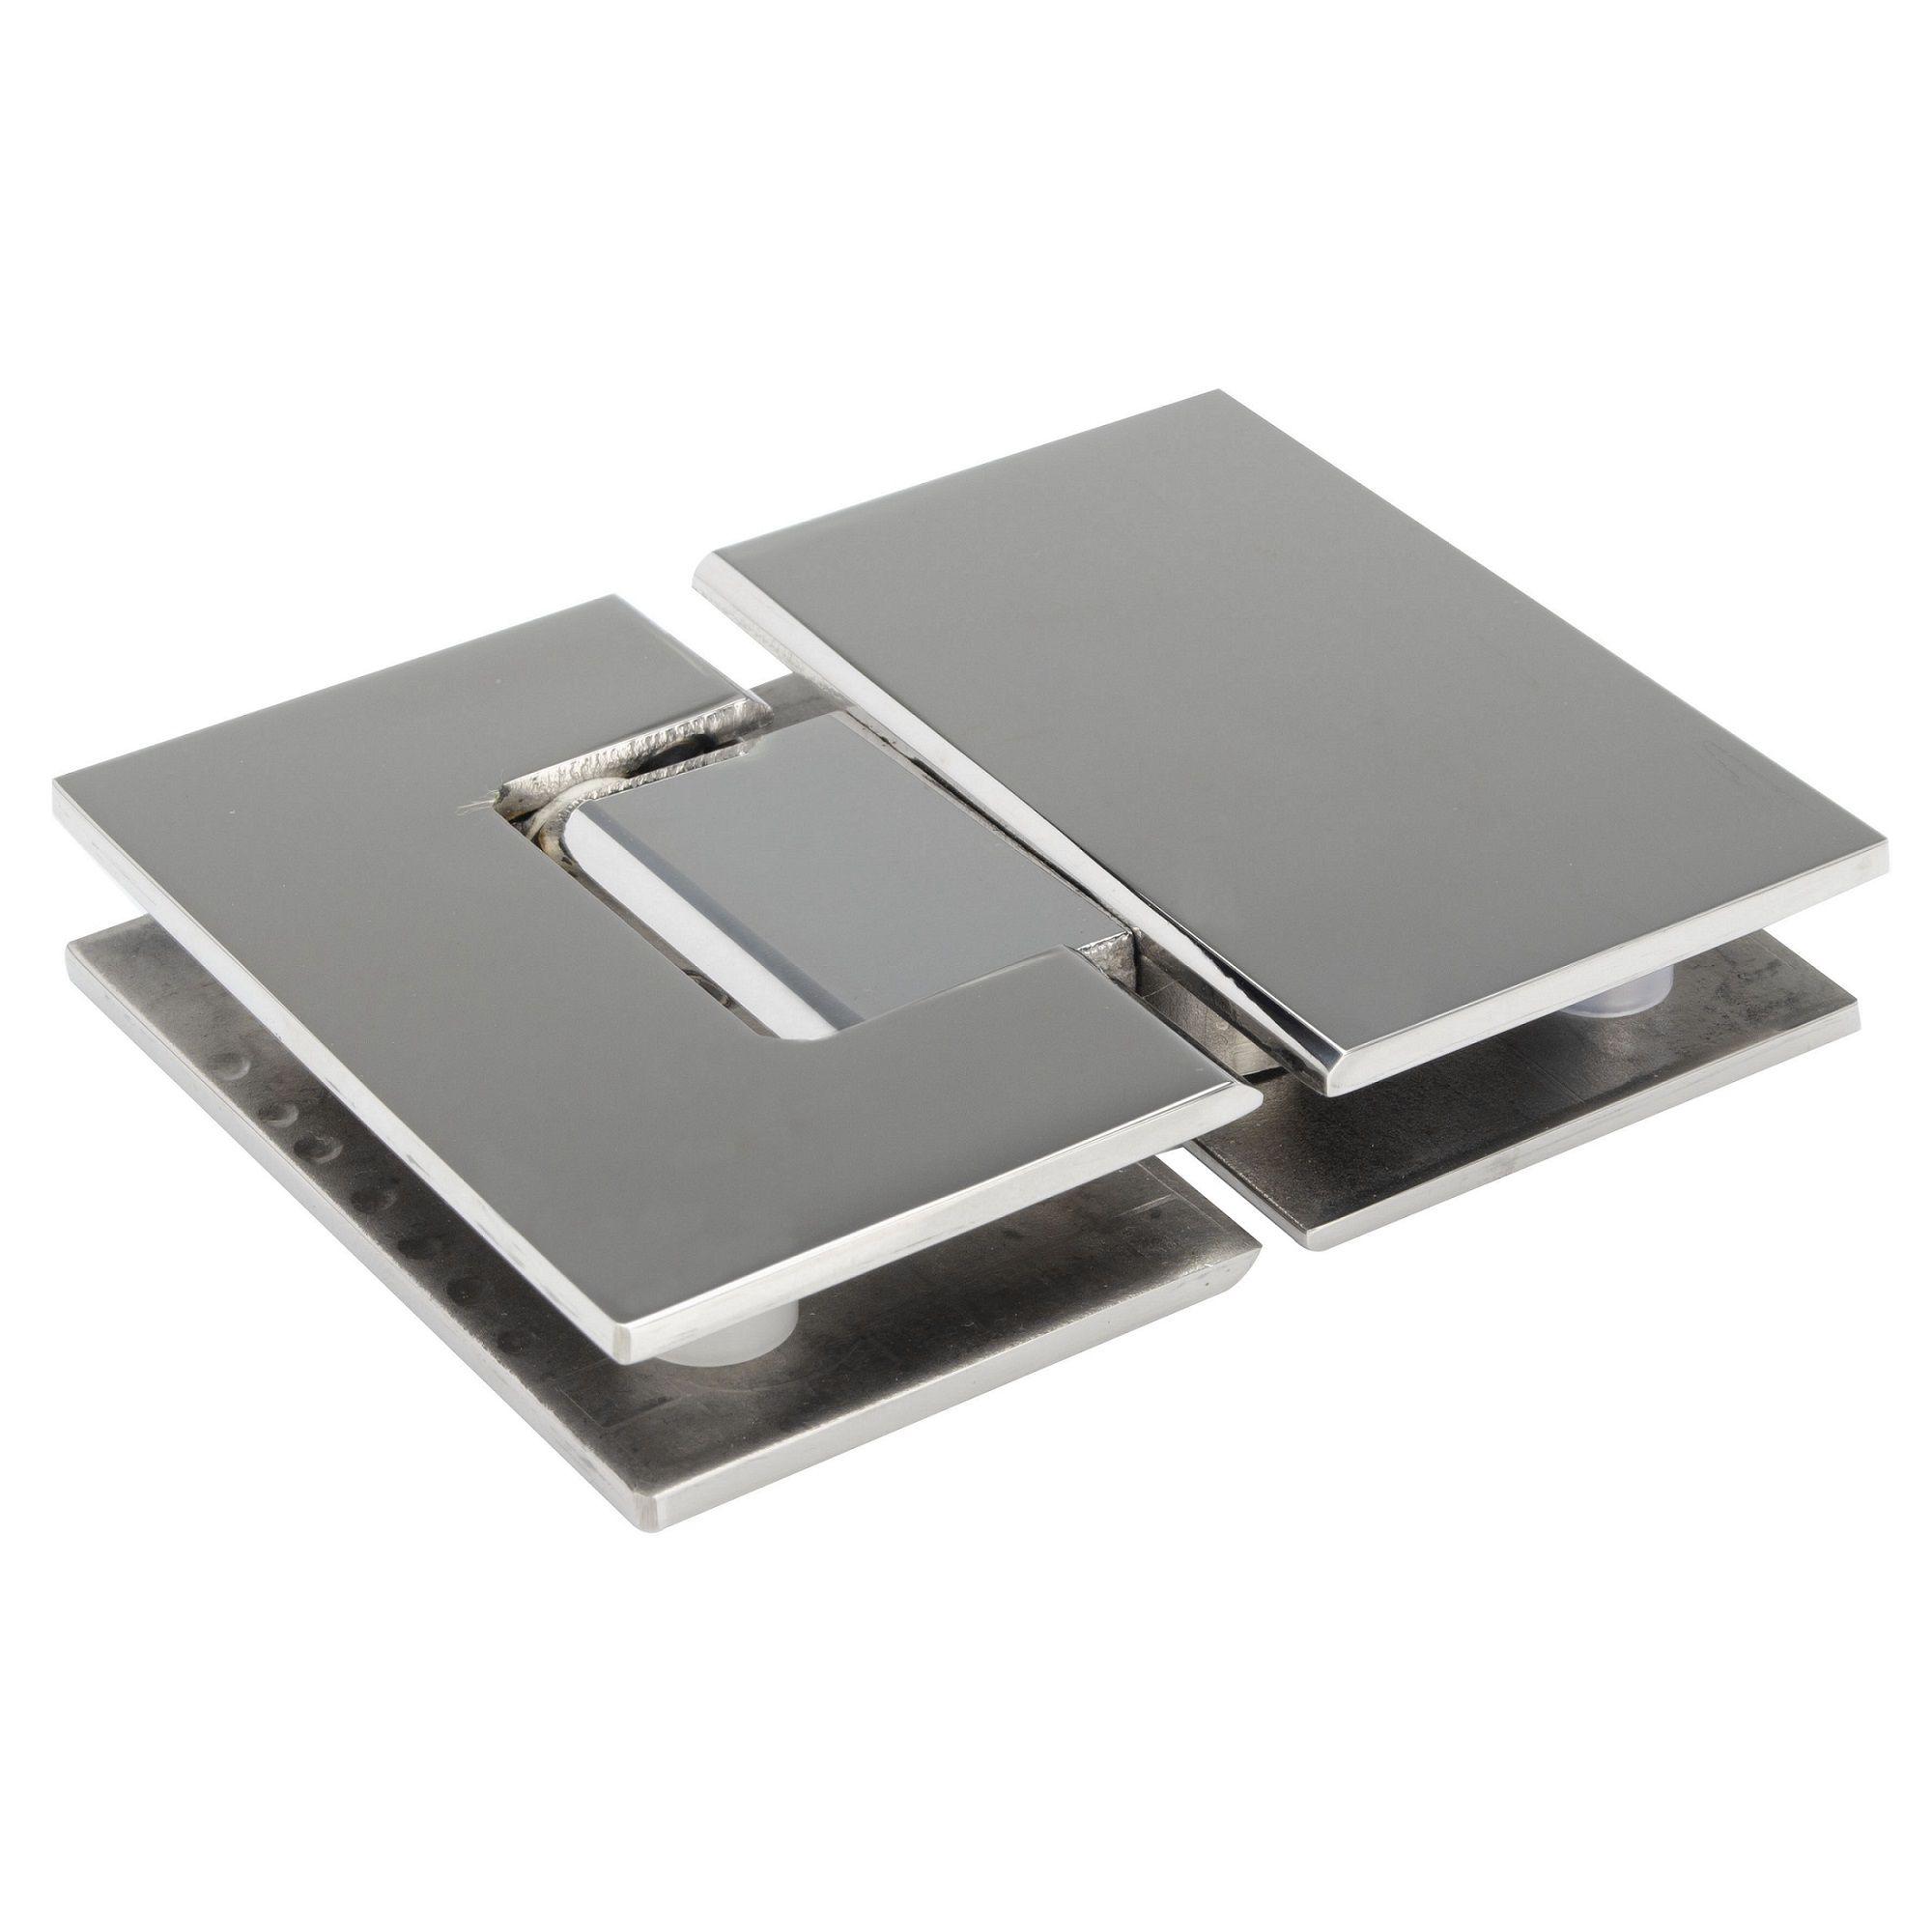 Dobradiça inox GV48 180°1010 para porta de vidro e box - vidro/vidro